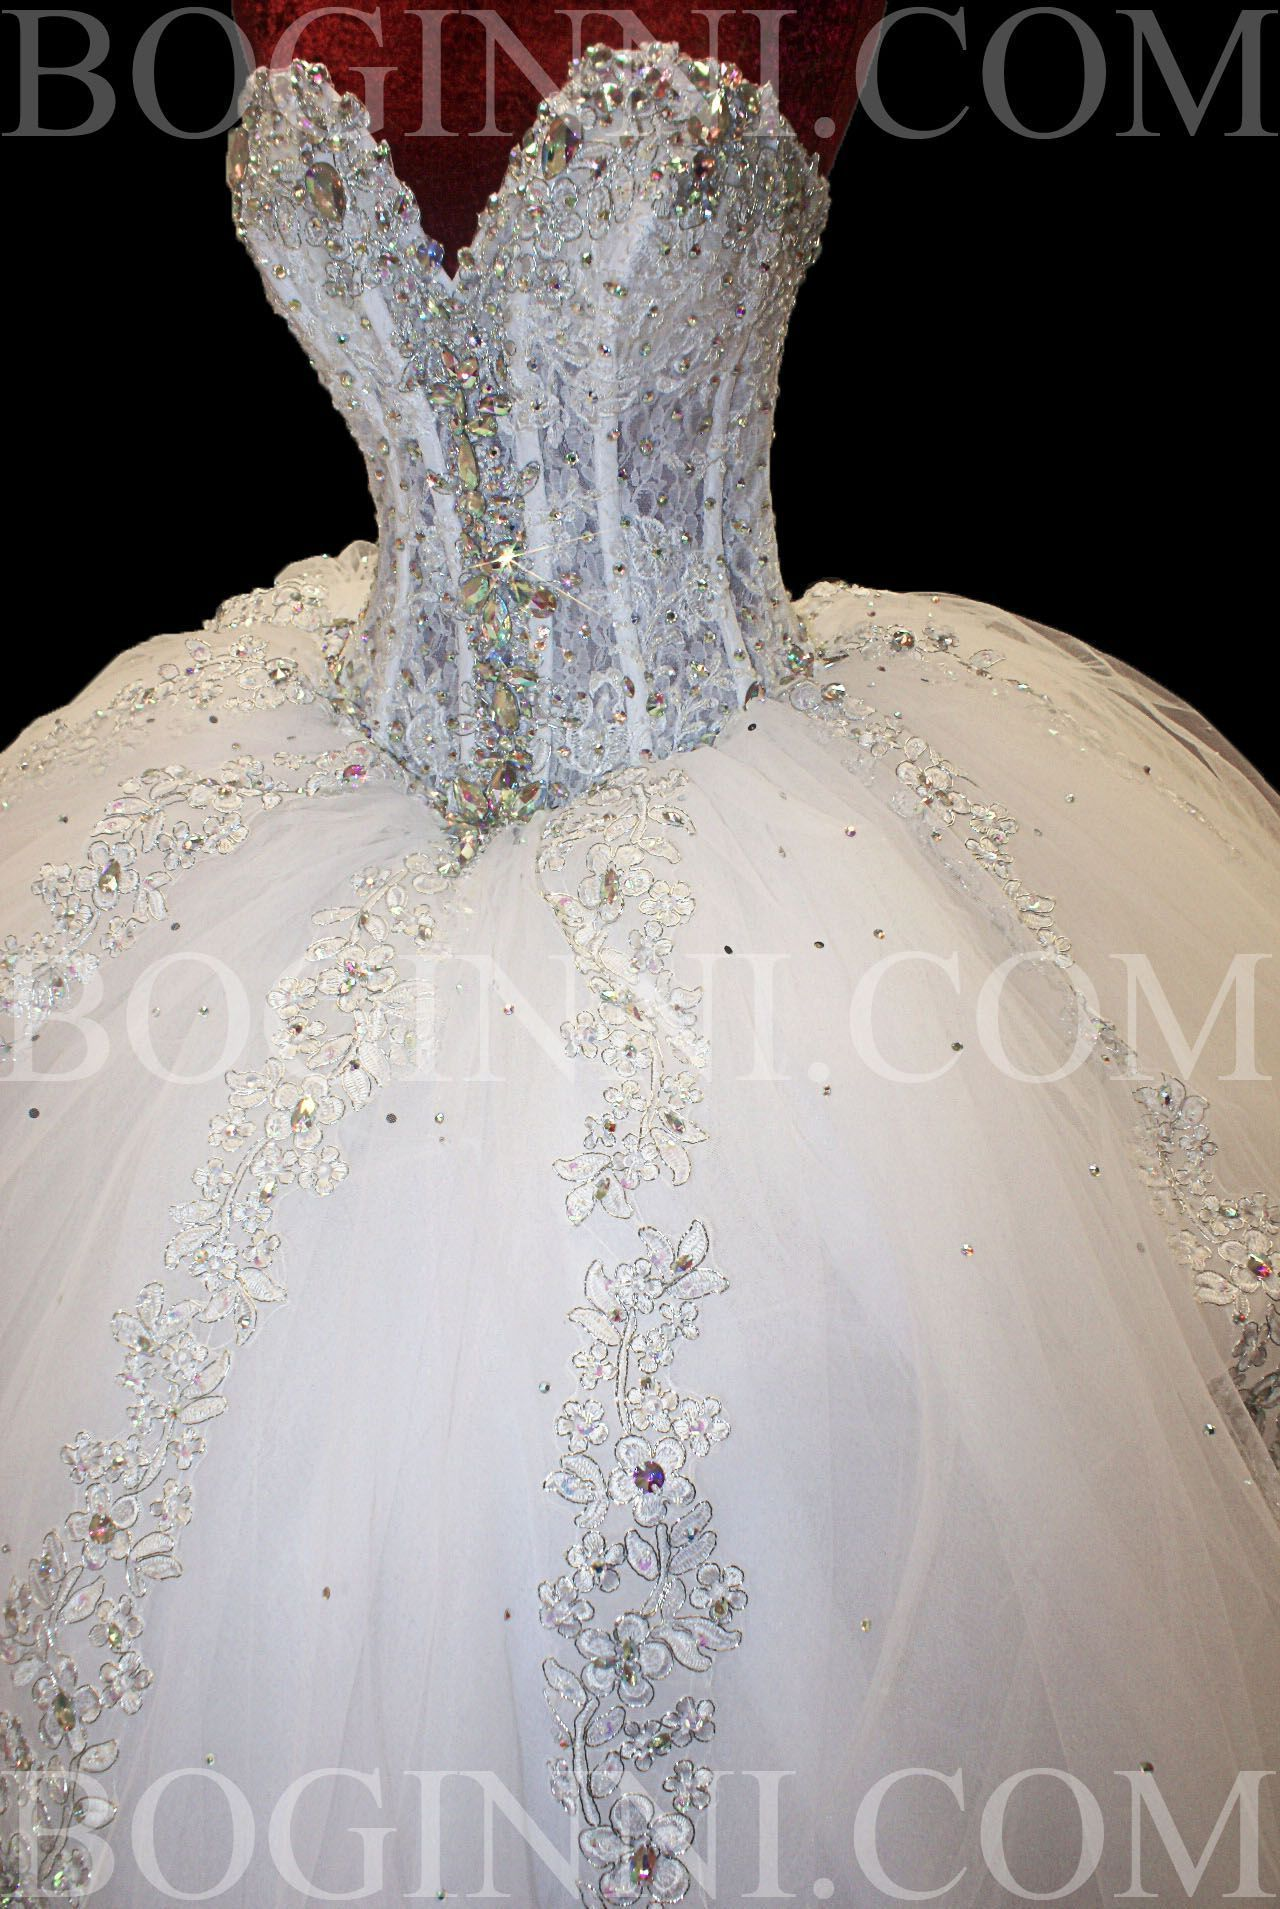 WHITE AB CRYSTAL LACE CORSET SWAROVSKI WEDDING DRESS